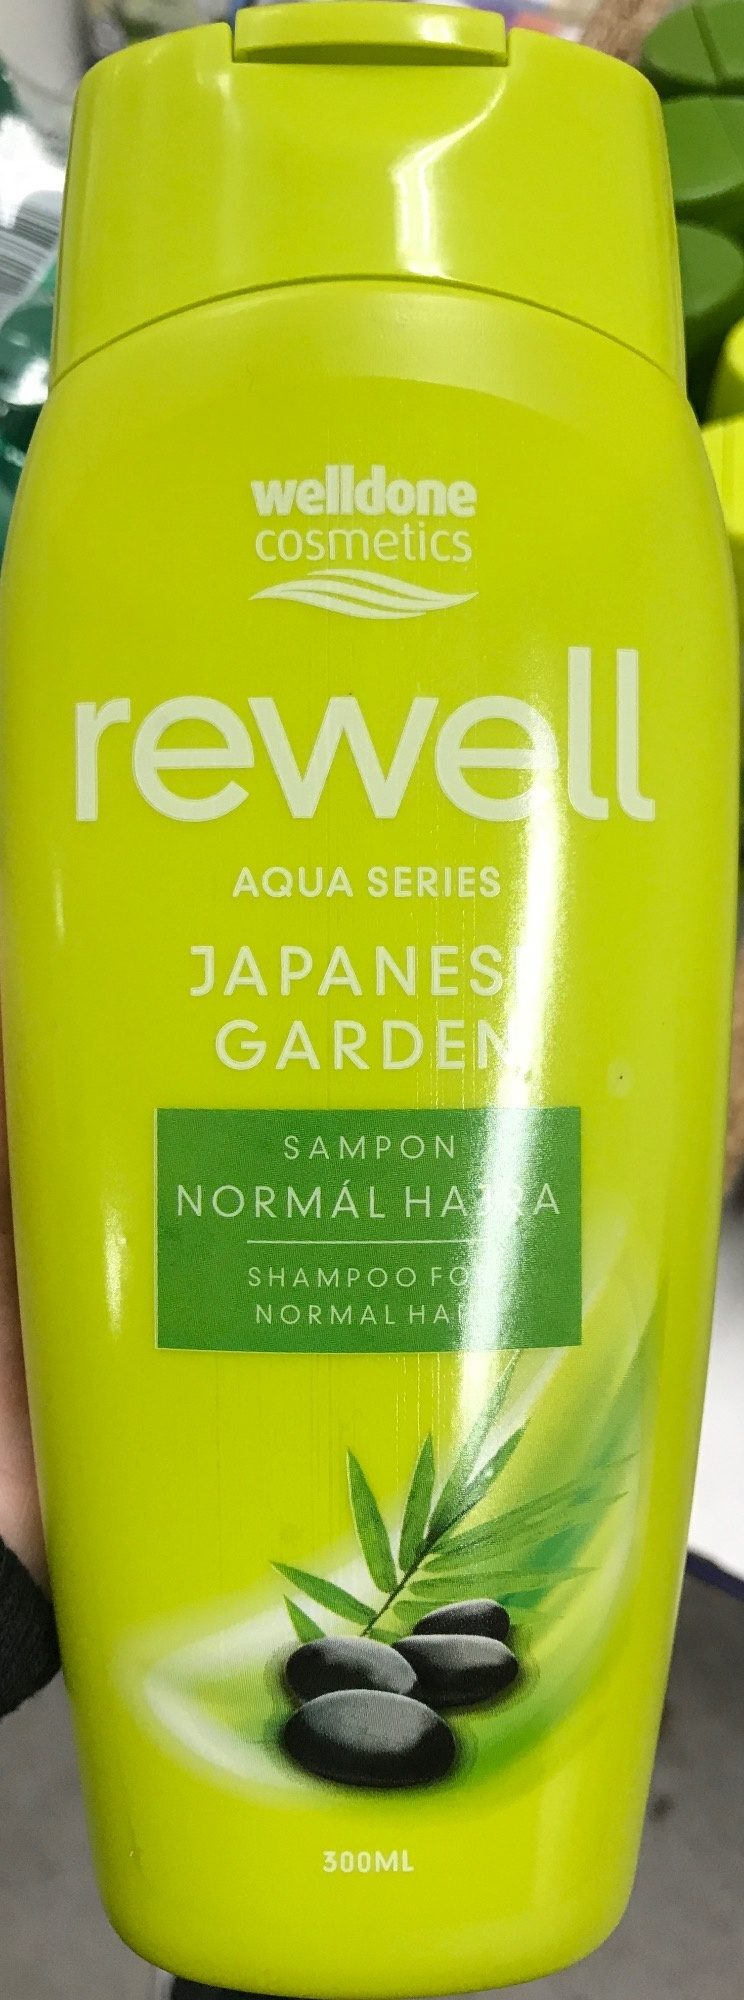 Rewell Aqua Series Japanese Garden - Product - fr